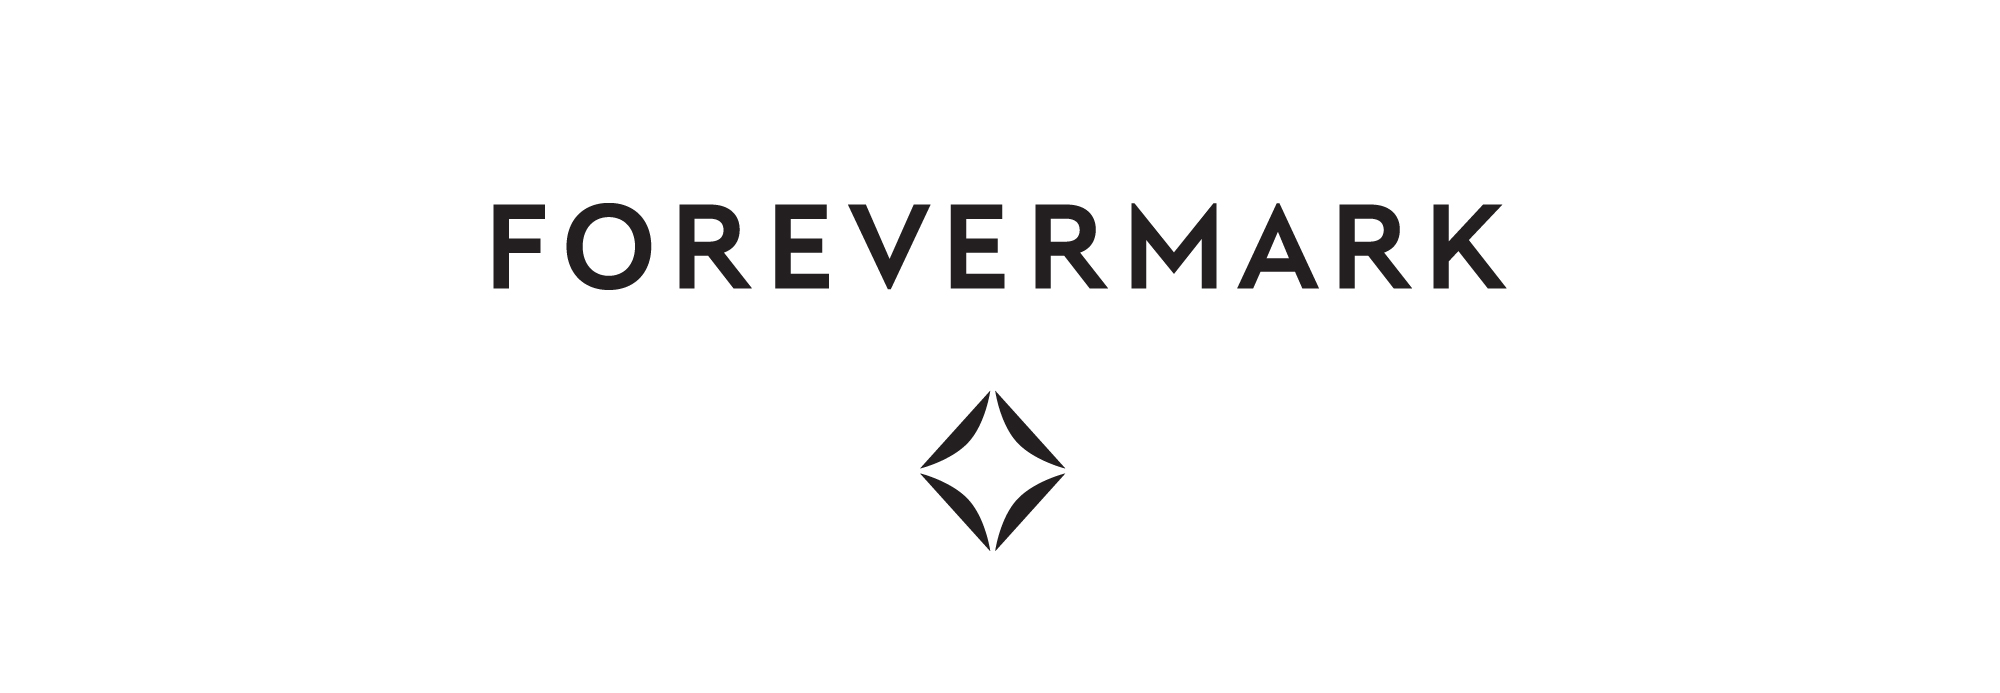 Jewellery new brand development - De Beers Forevermark Diamonds luxury jewellery brand